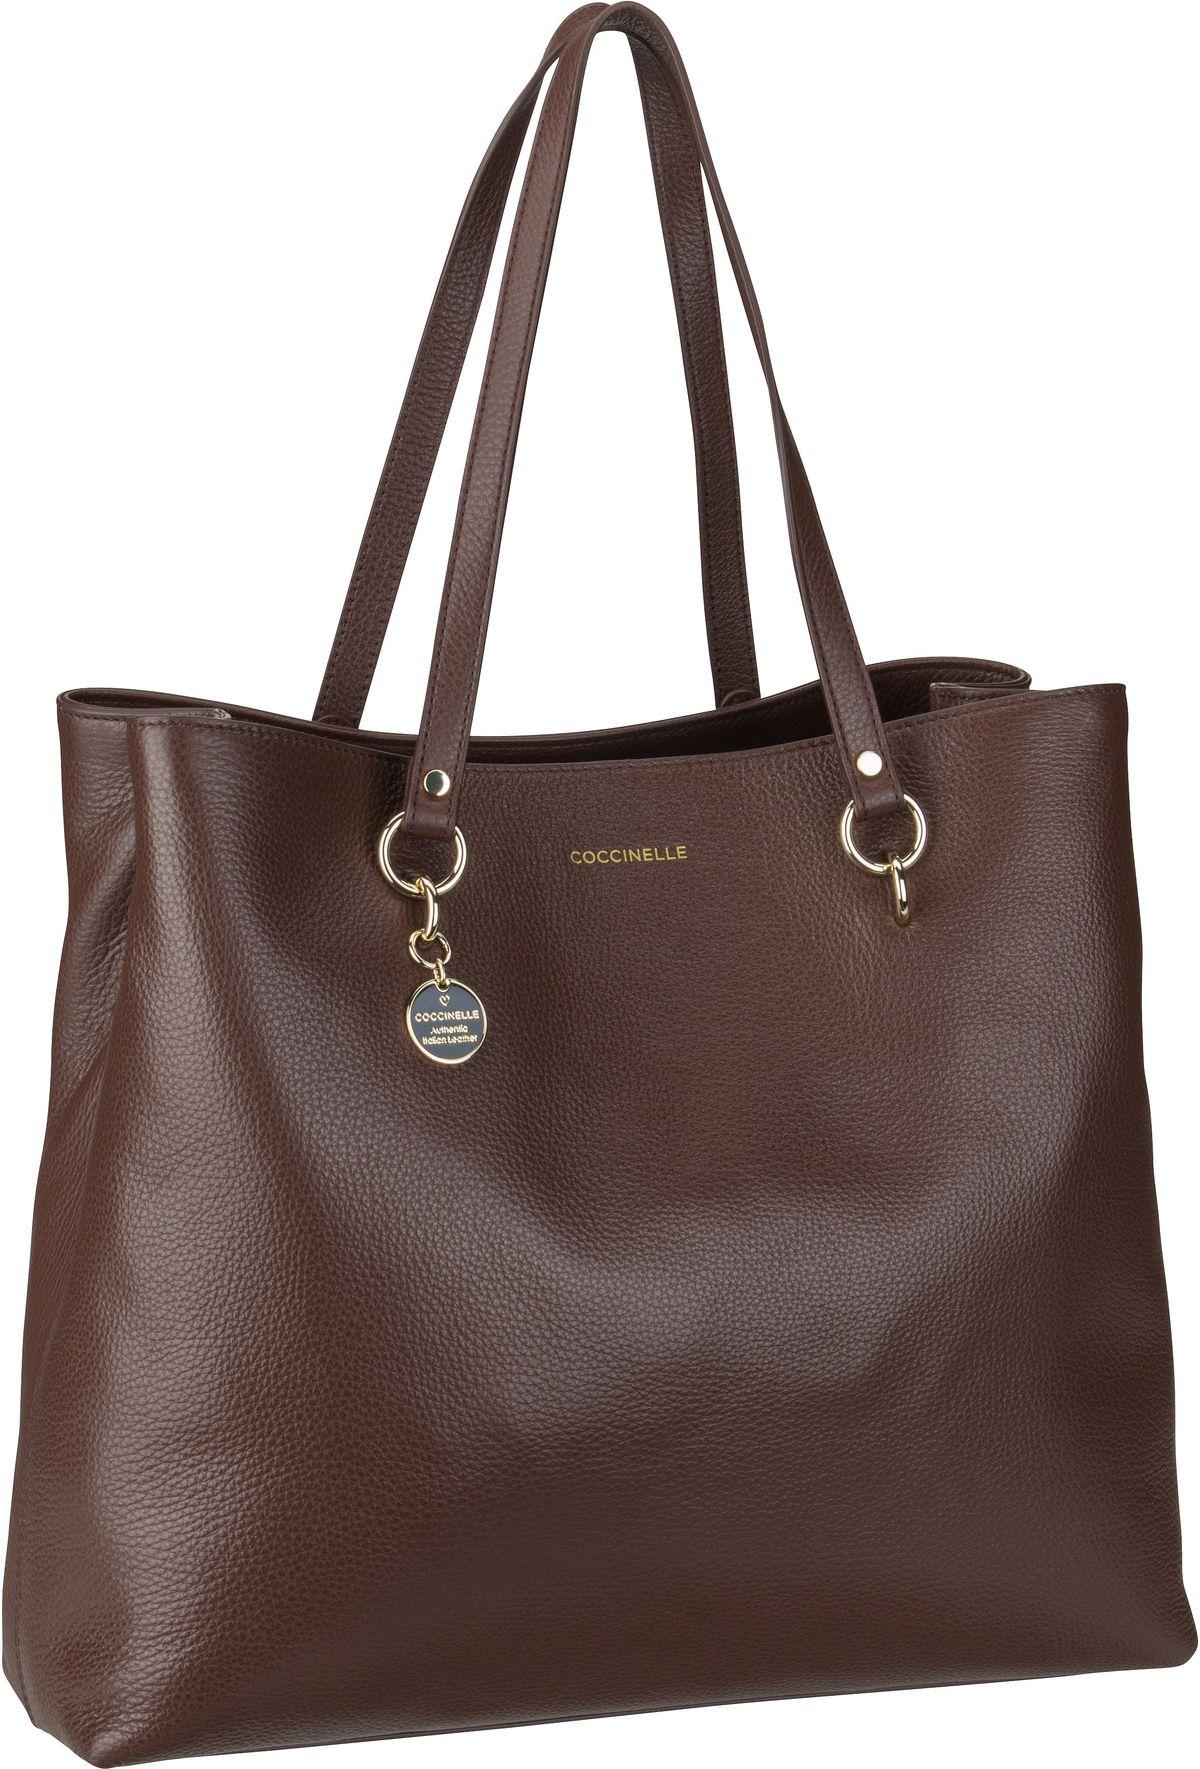 Handtasche Alpha 1103 Chocolate